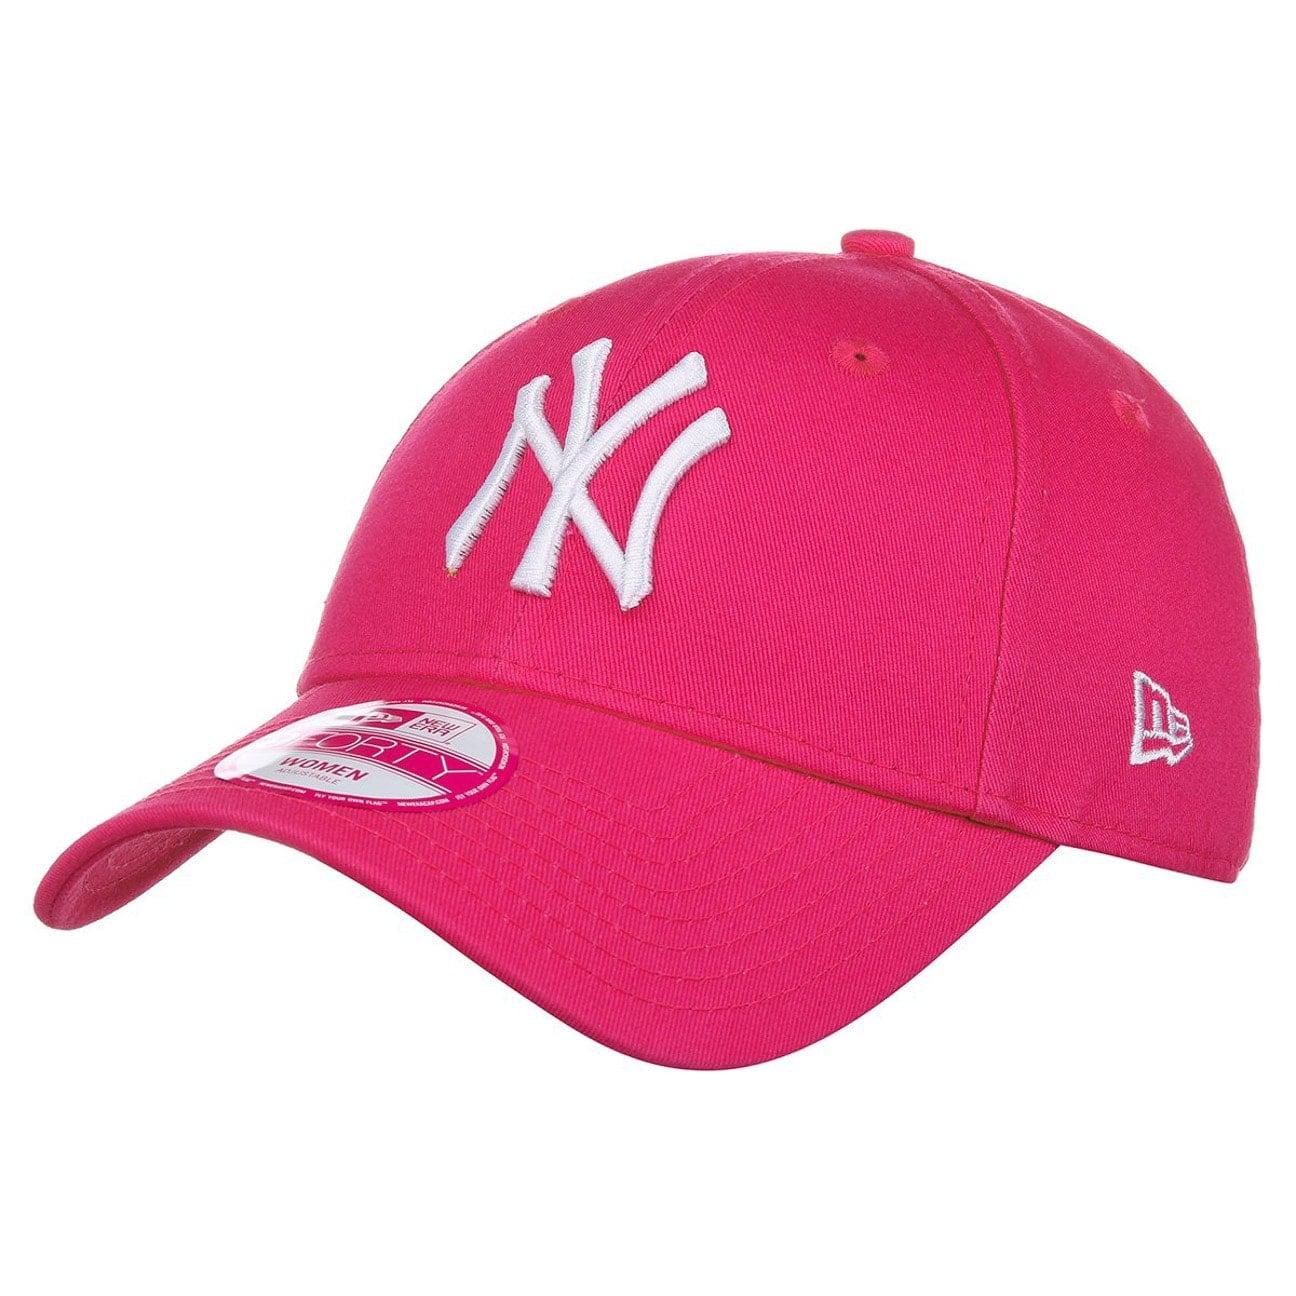 Fash Ess 940 Baseball Cap by New Era